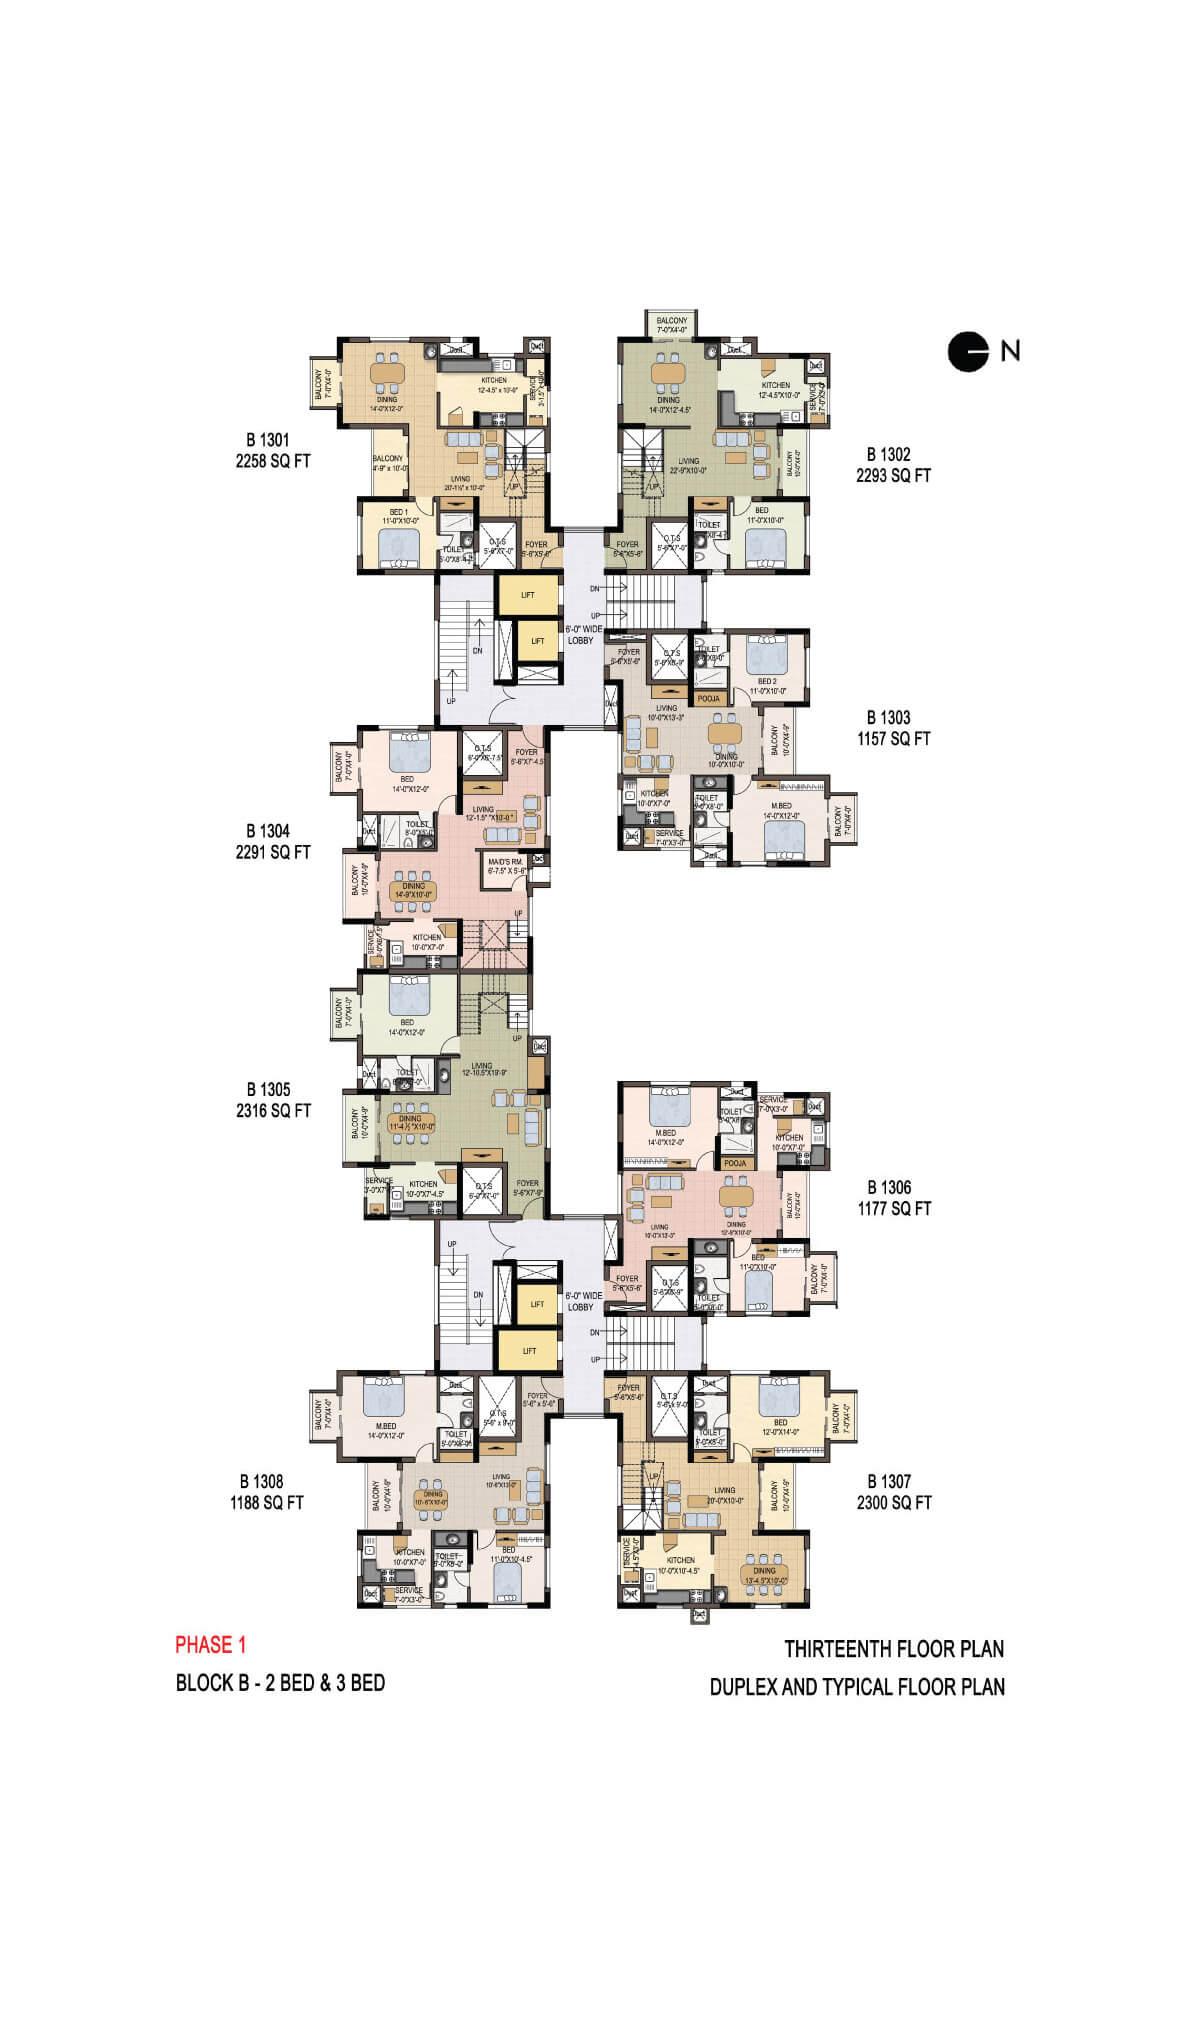 Thirteenth Floor Plan